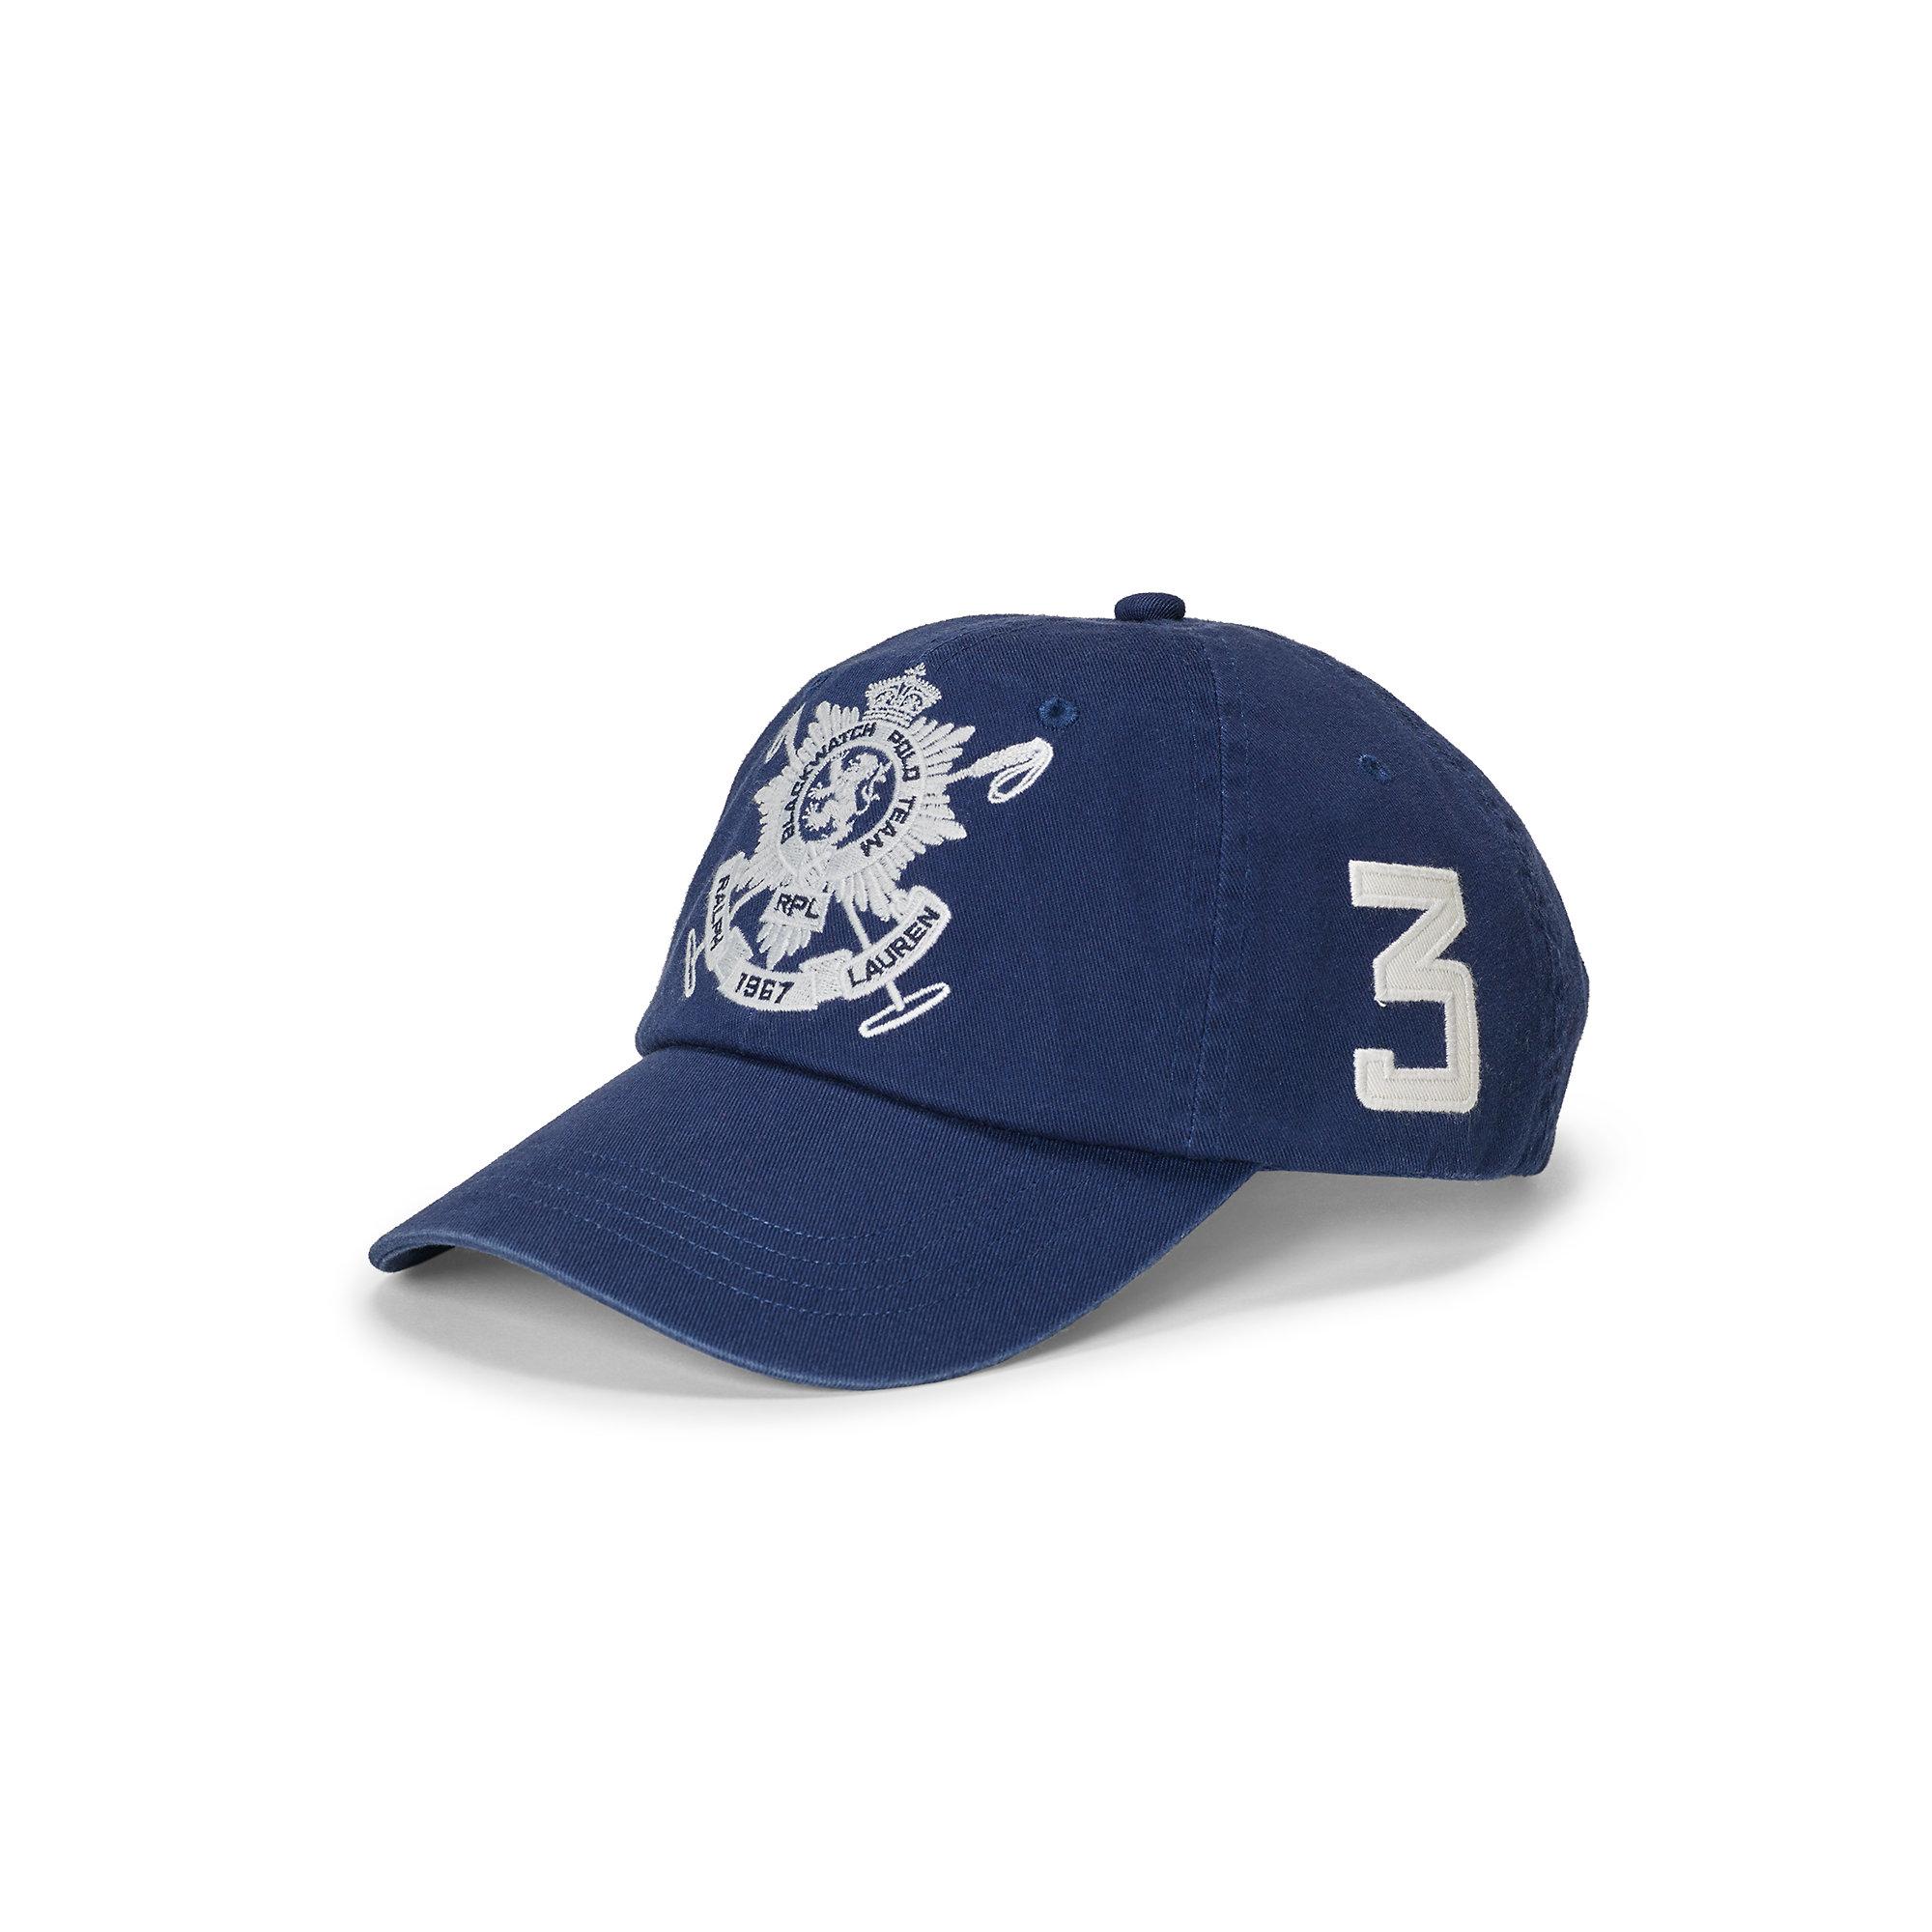 Lyst - Polo Ralph Lauren Blackwatch Cotton Baseball Cap in Blue for Men ca5e5fa9f96f